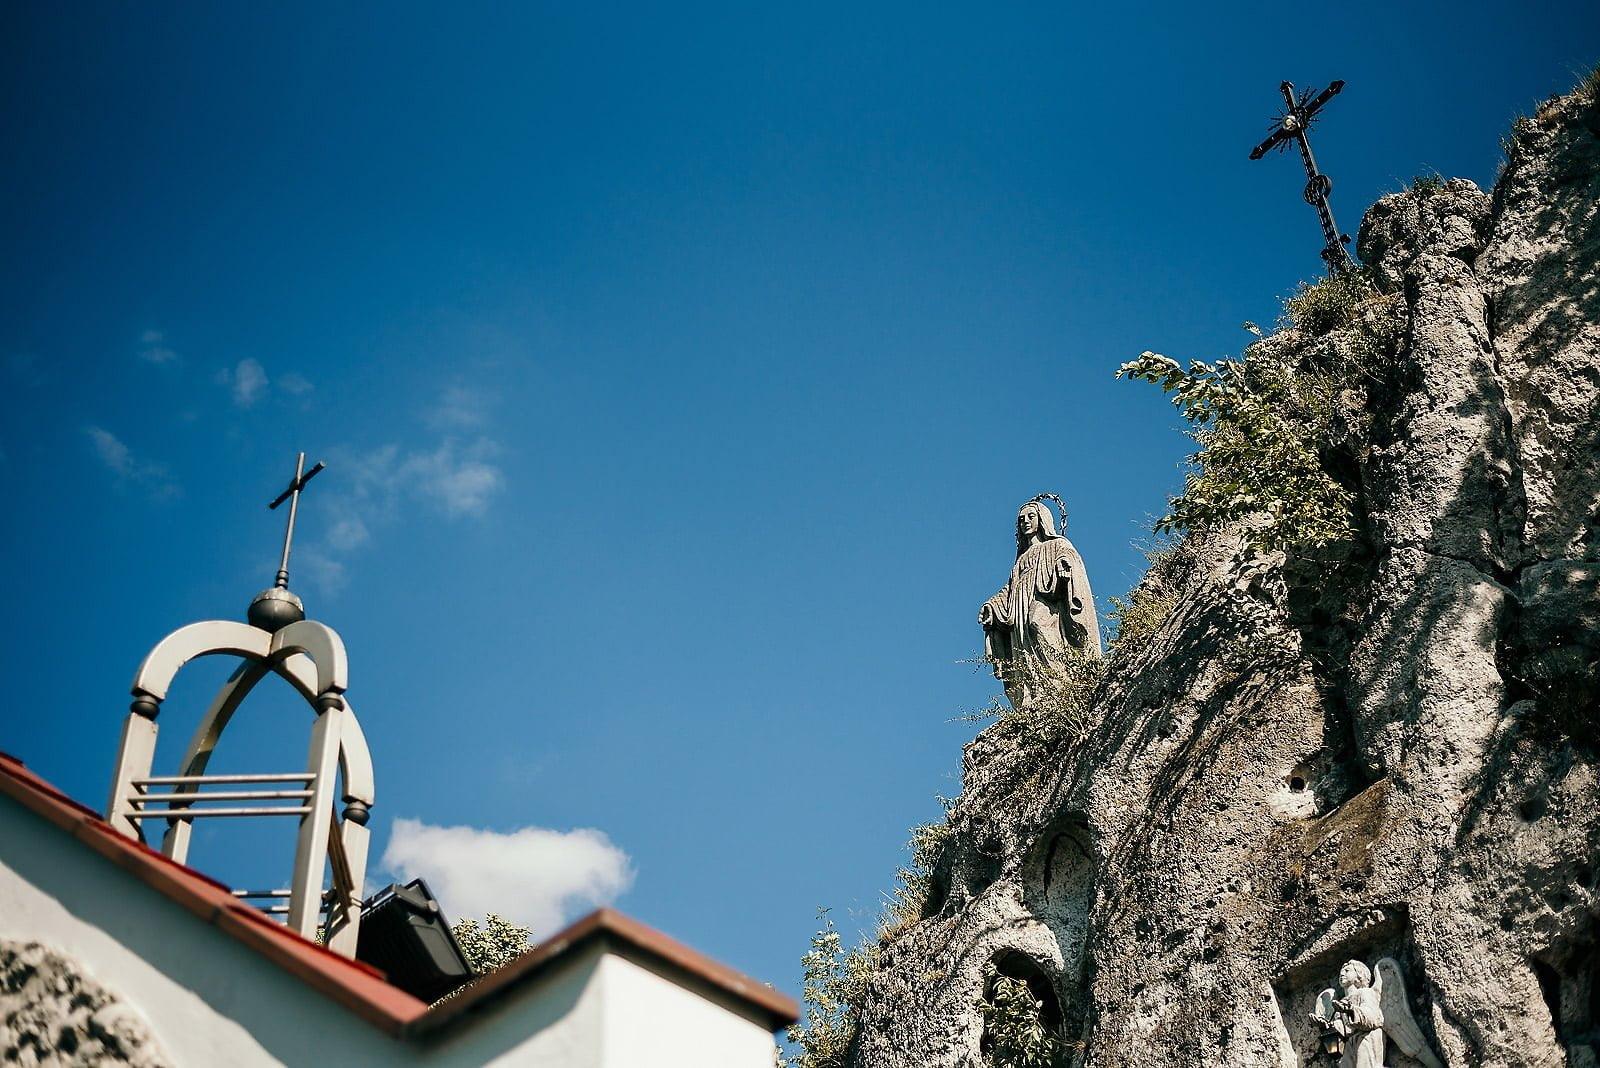 Gabi i Kuba - Sanktuarium Matki Bożej Skałkowej 28